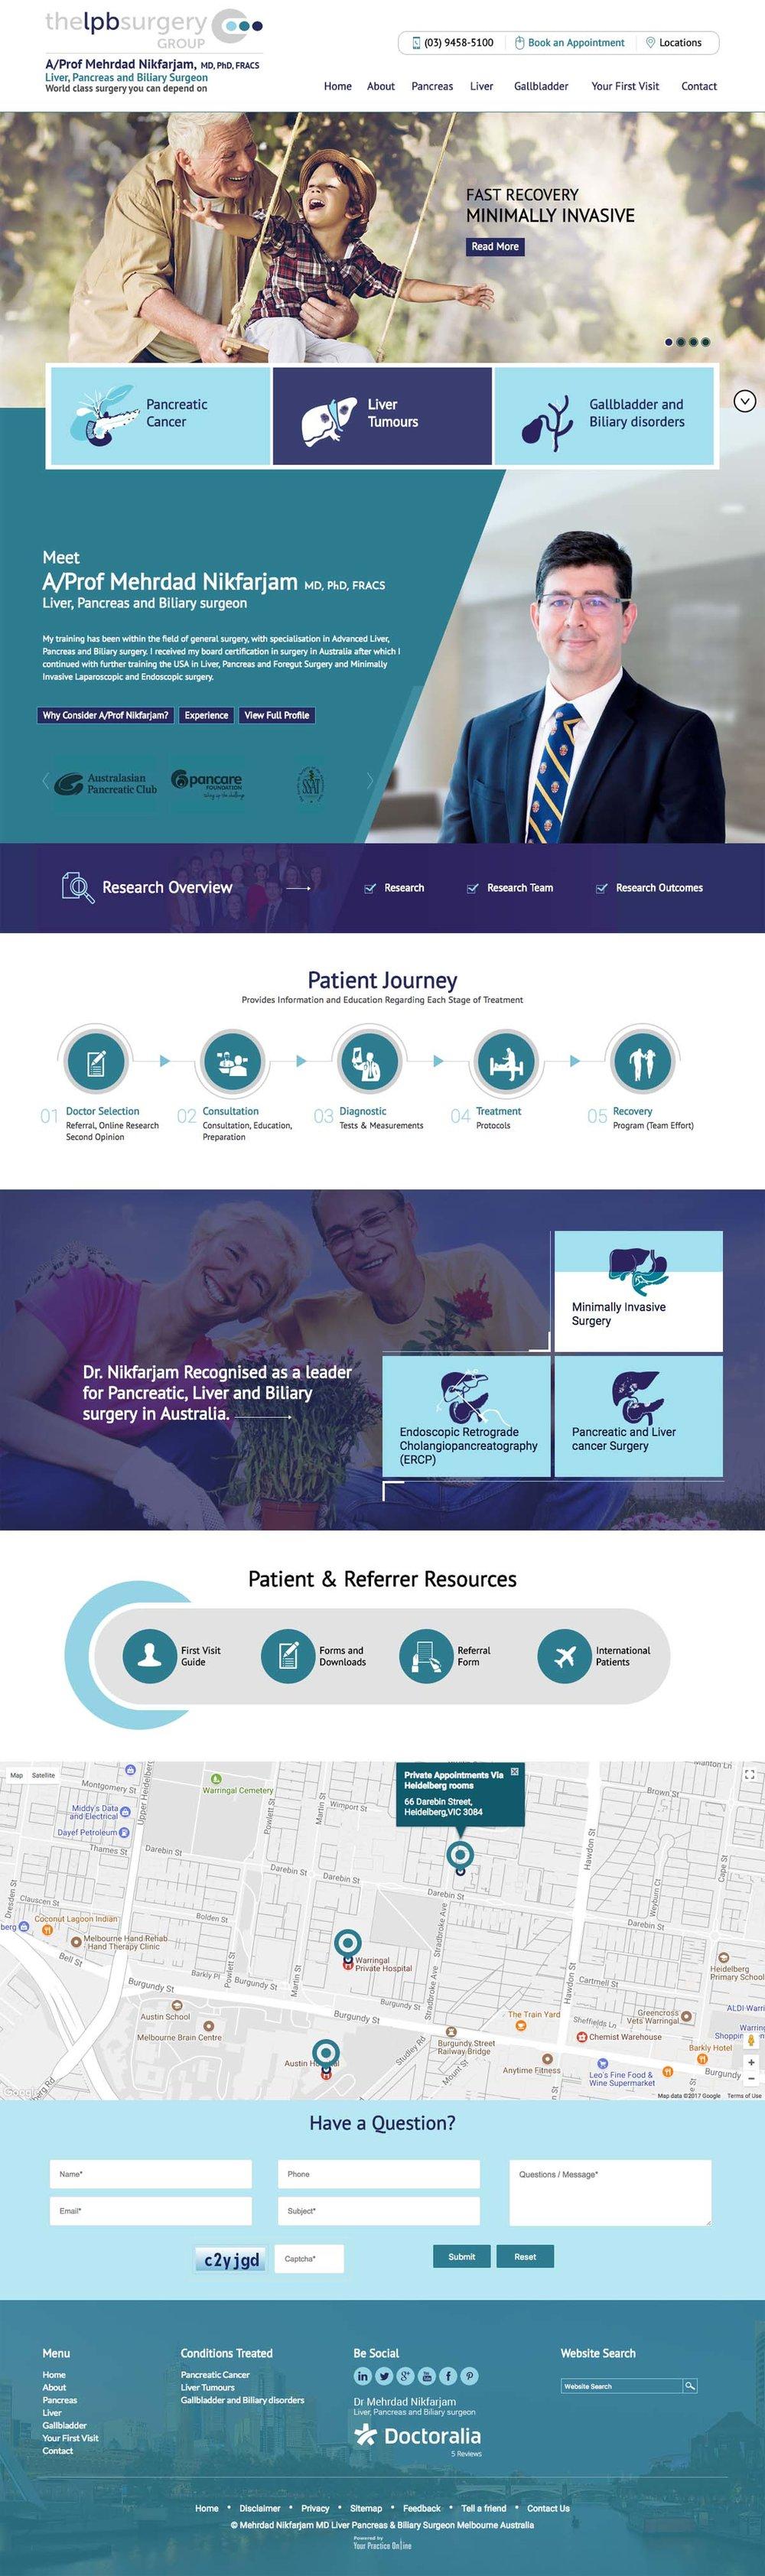 Minimally Invasive  Pancreas  Gallbladder  Liver   Biliary Surgery  Melbourne Australia.jpg